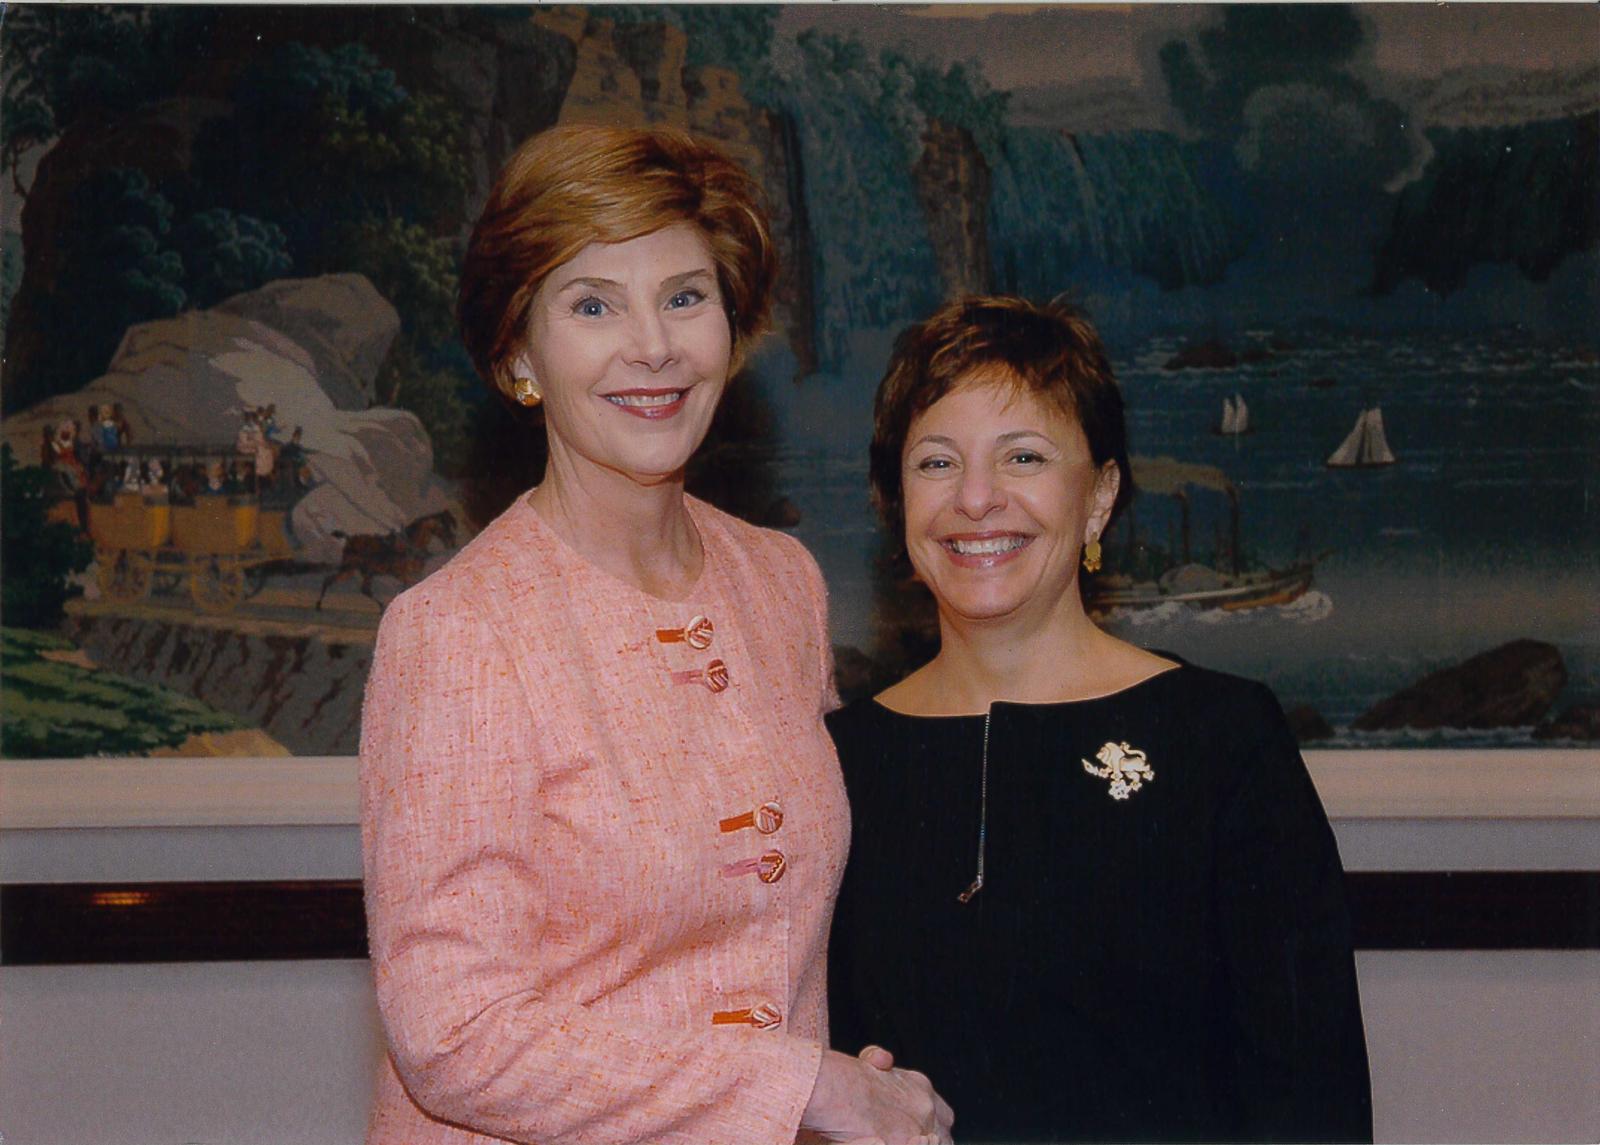 Laura Bush and Michele Rosen, 2005.